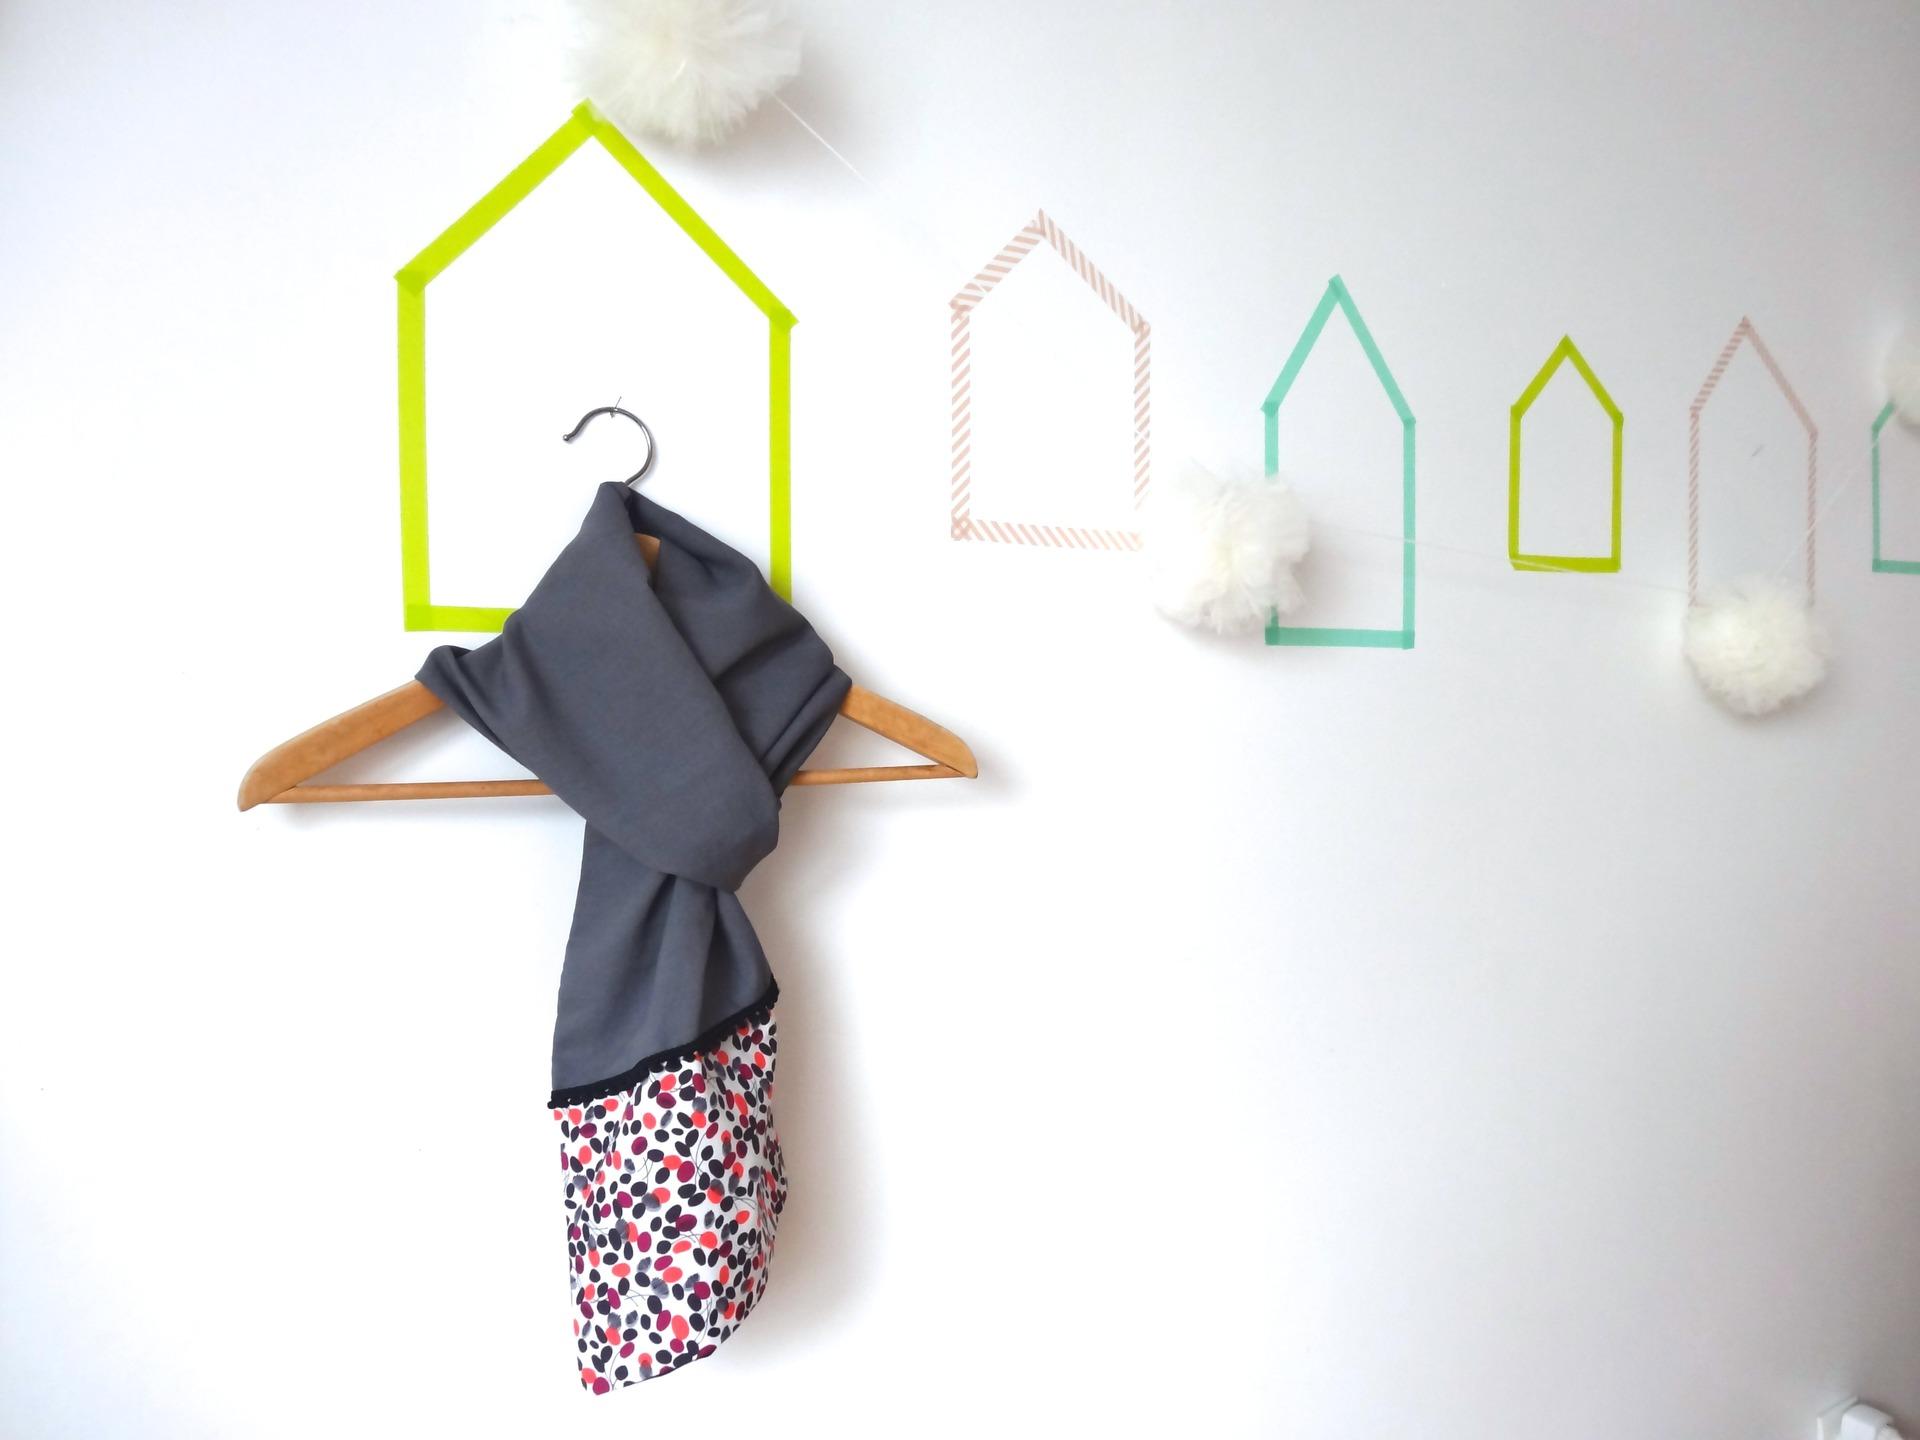 mon mari a trouv la meilleure idee cadeau noel. Black Bedroom Furniture Sets. Home Design Ideas